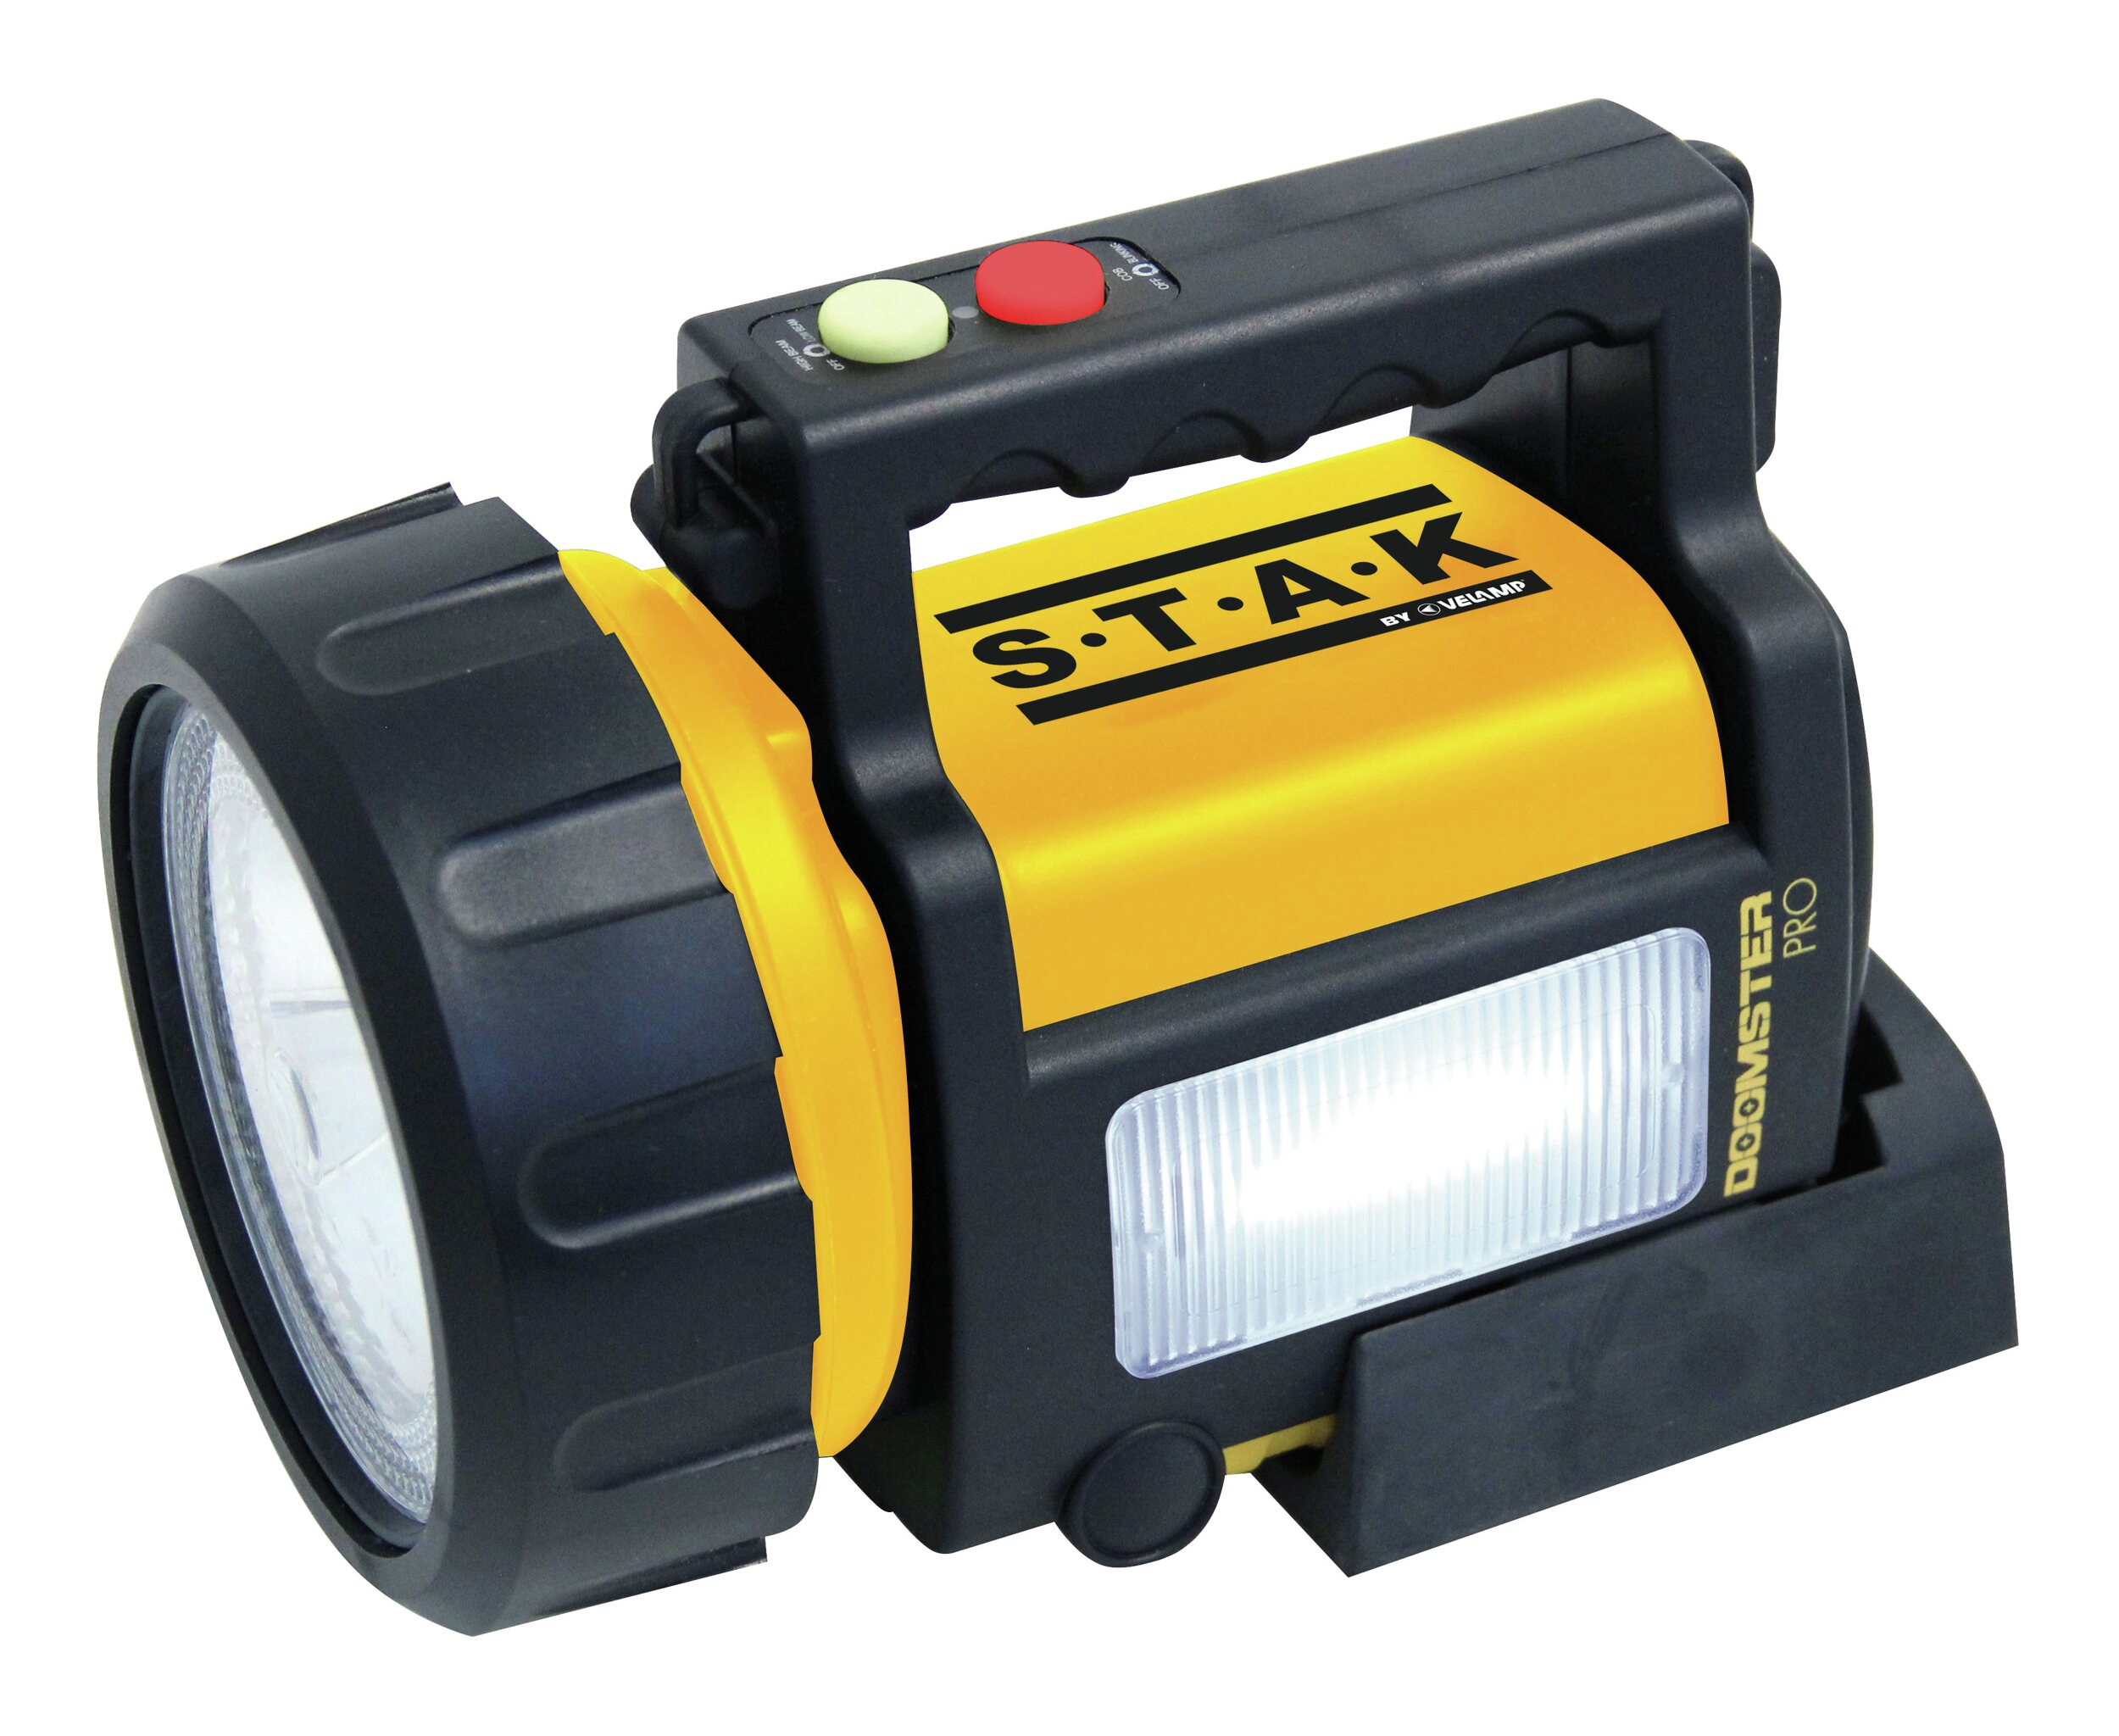 Velamp Arbeitslampe Akku ST 999-5L mit Ladestation - ST999-5L